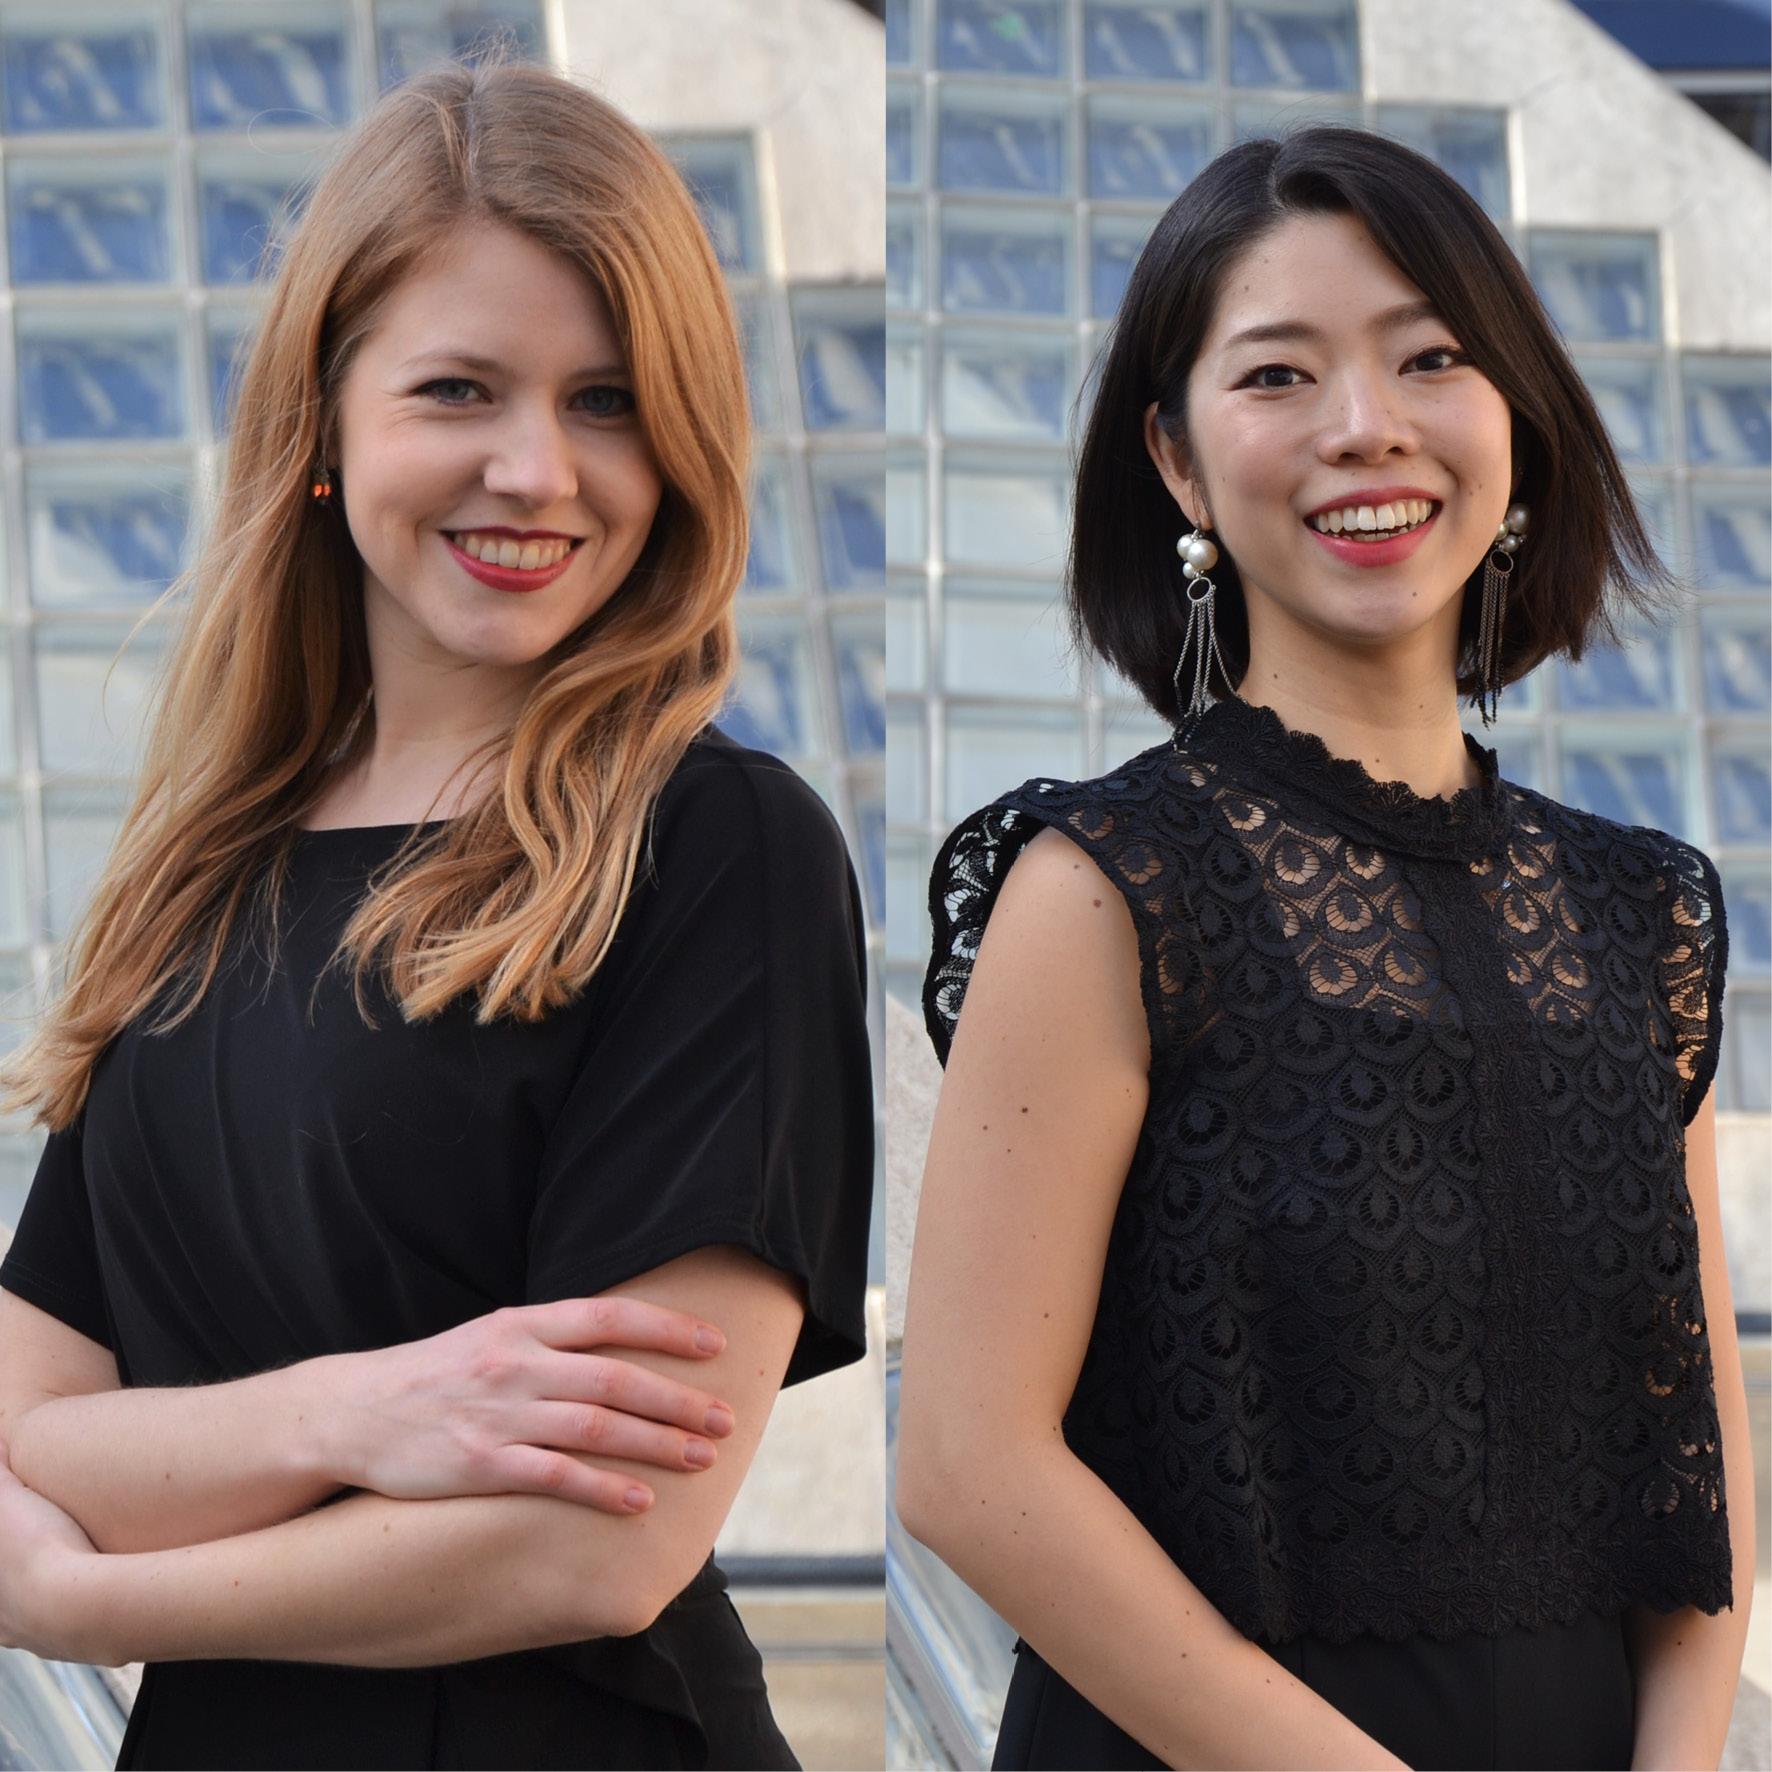 Duo 19: Stefanie Knorr / Aimi Sugo